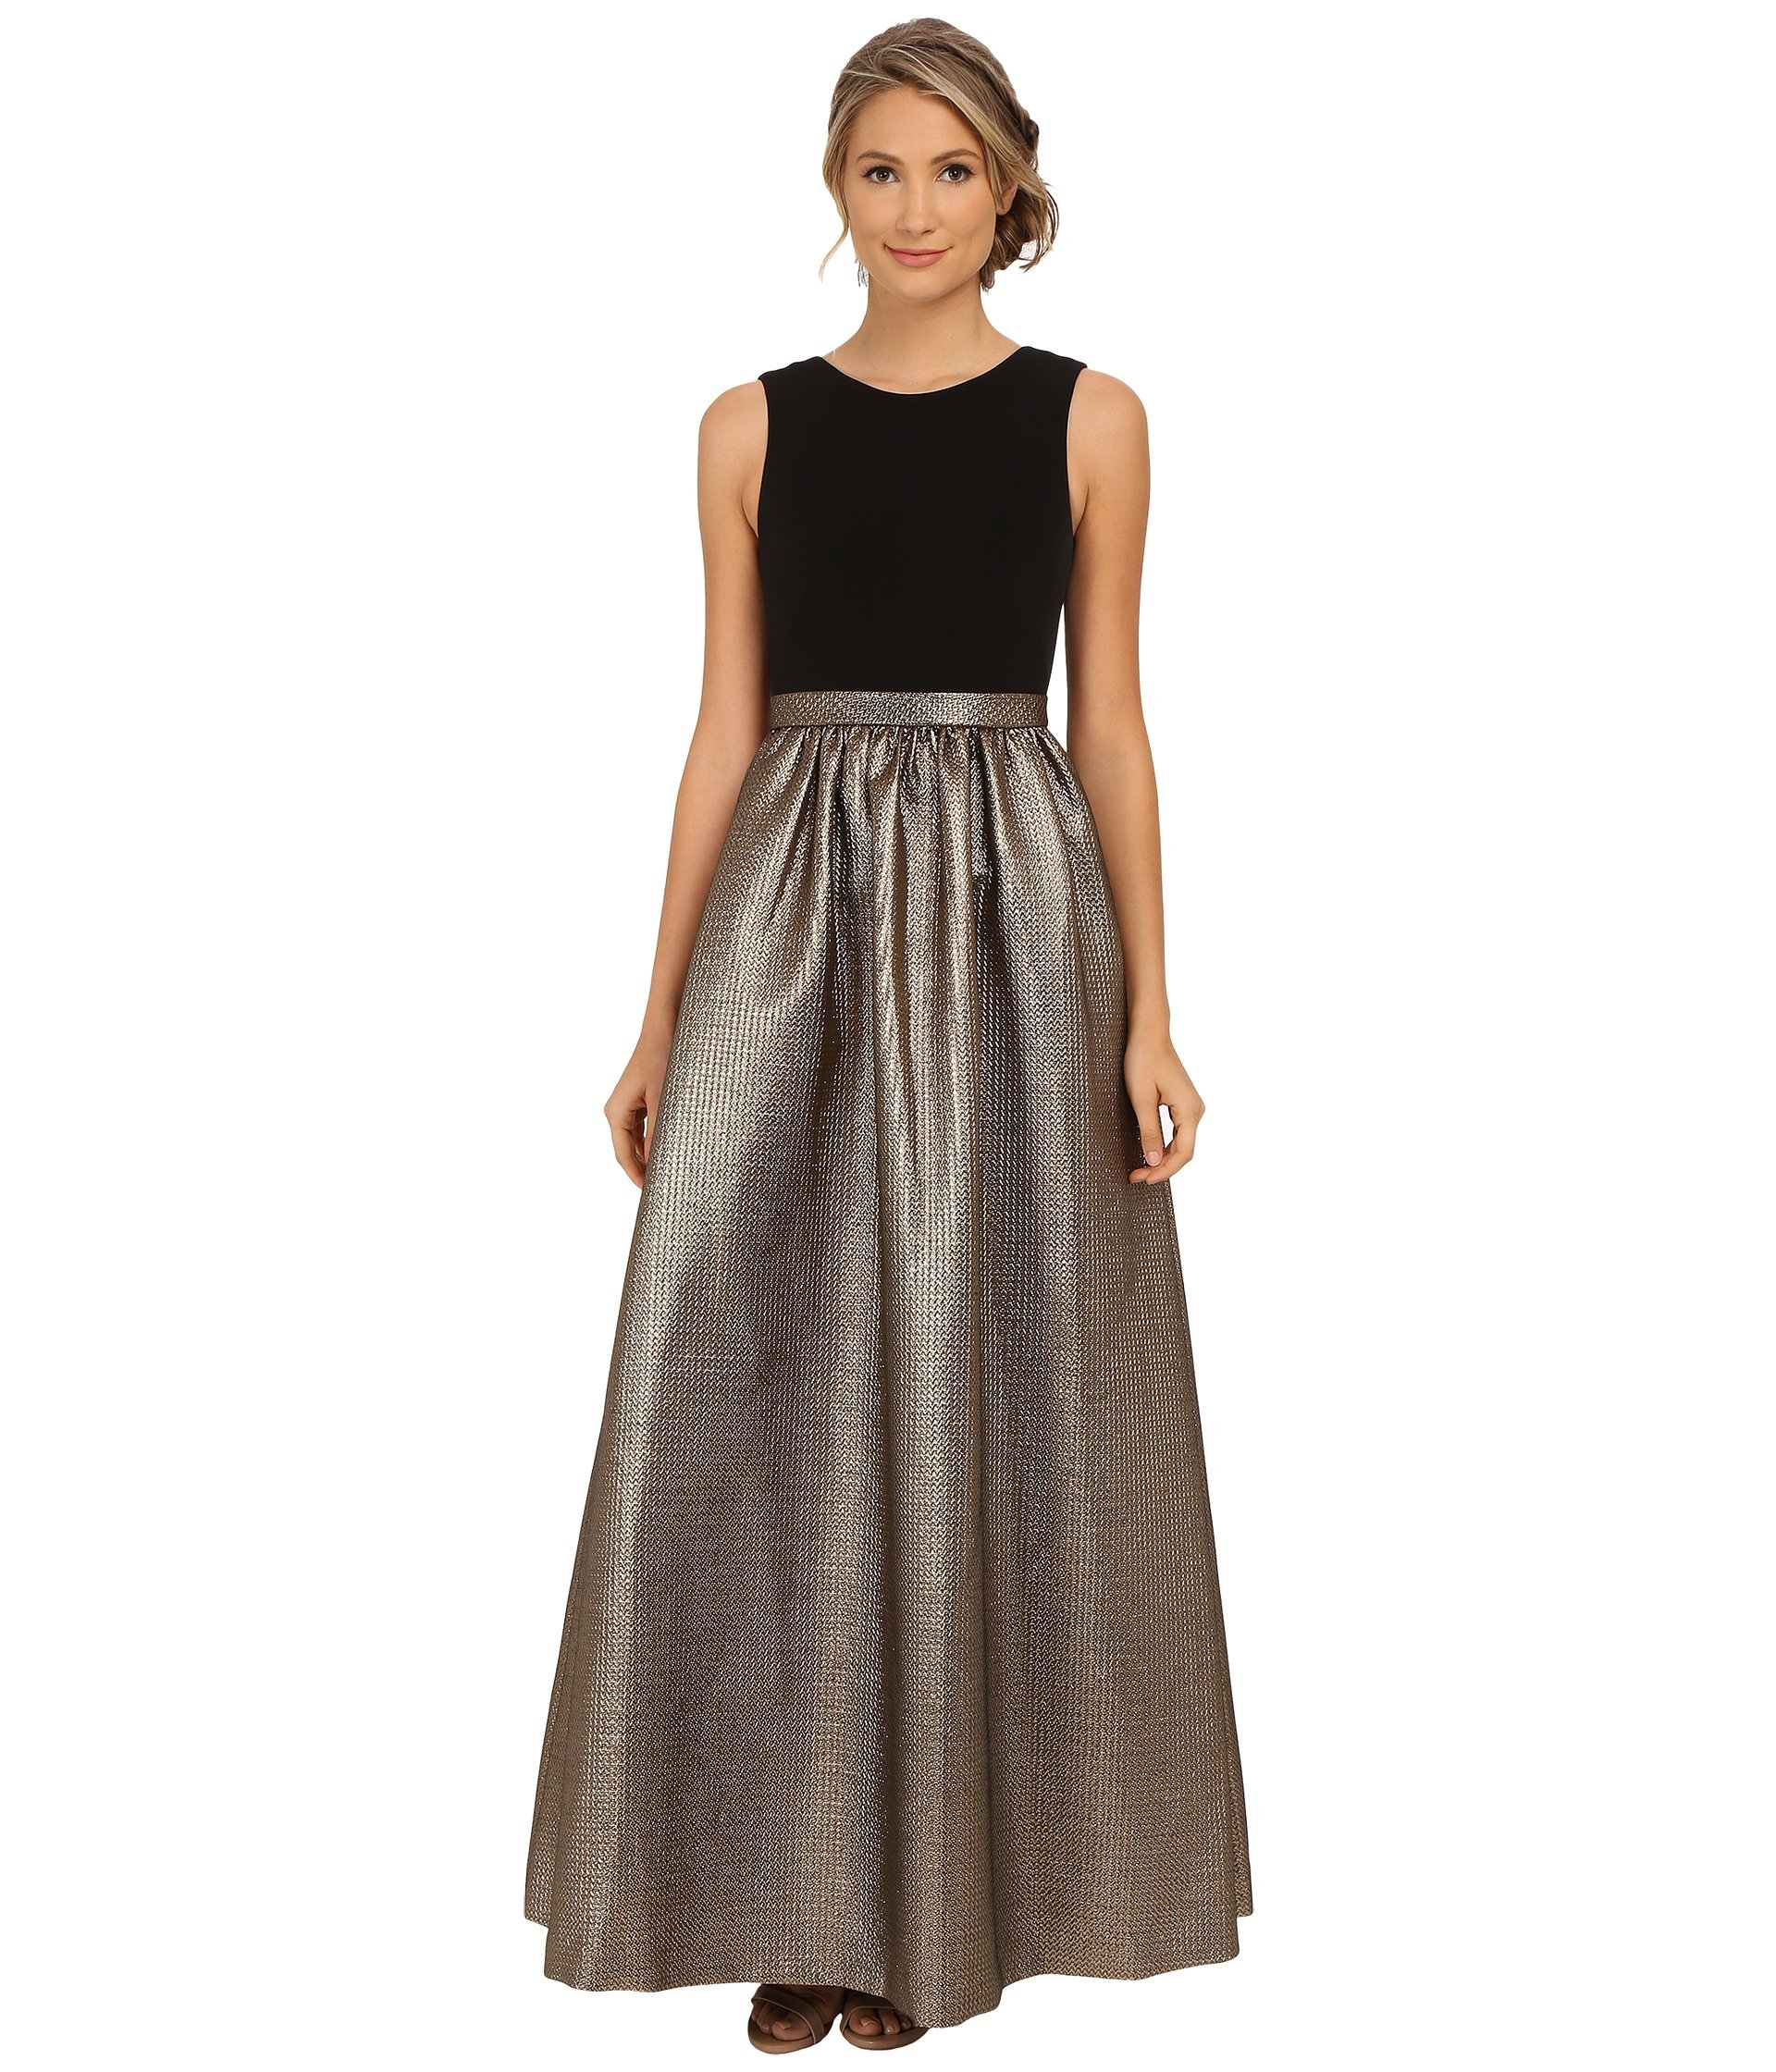 0aedb7190ac2d Lyst - Calvin Klein Sleeveless Ballgown in Metallic